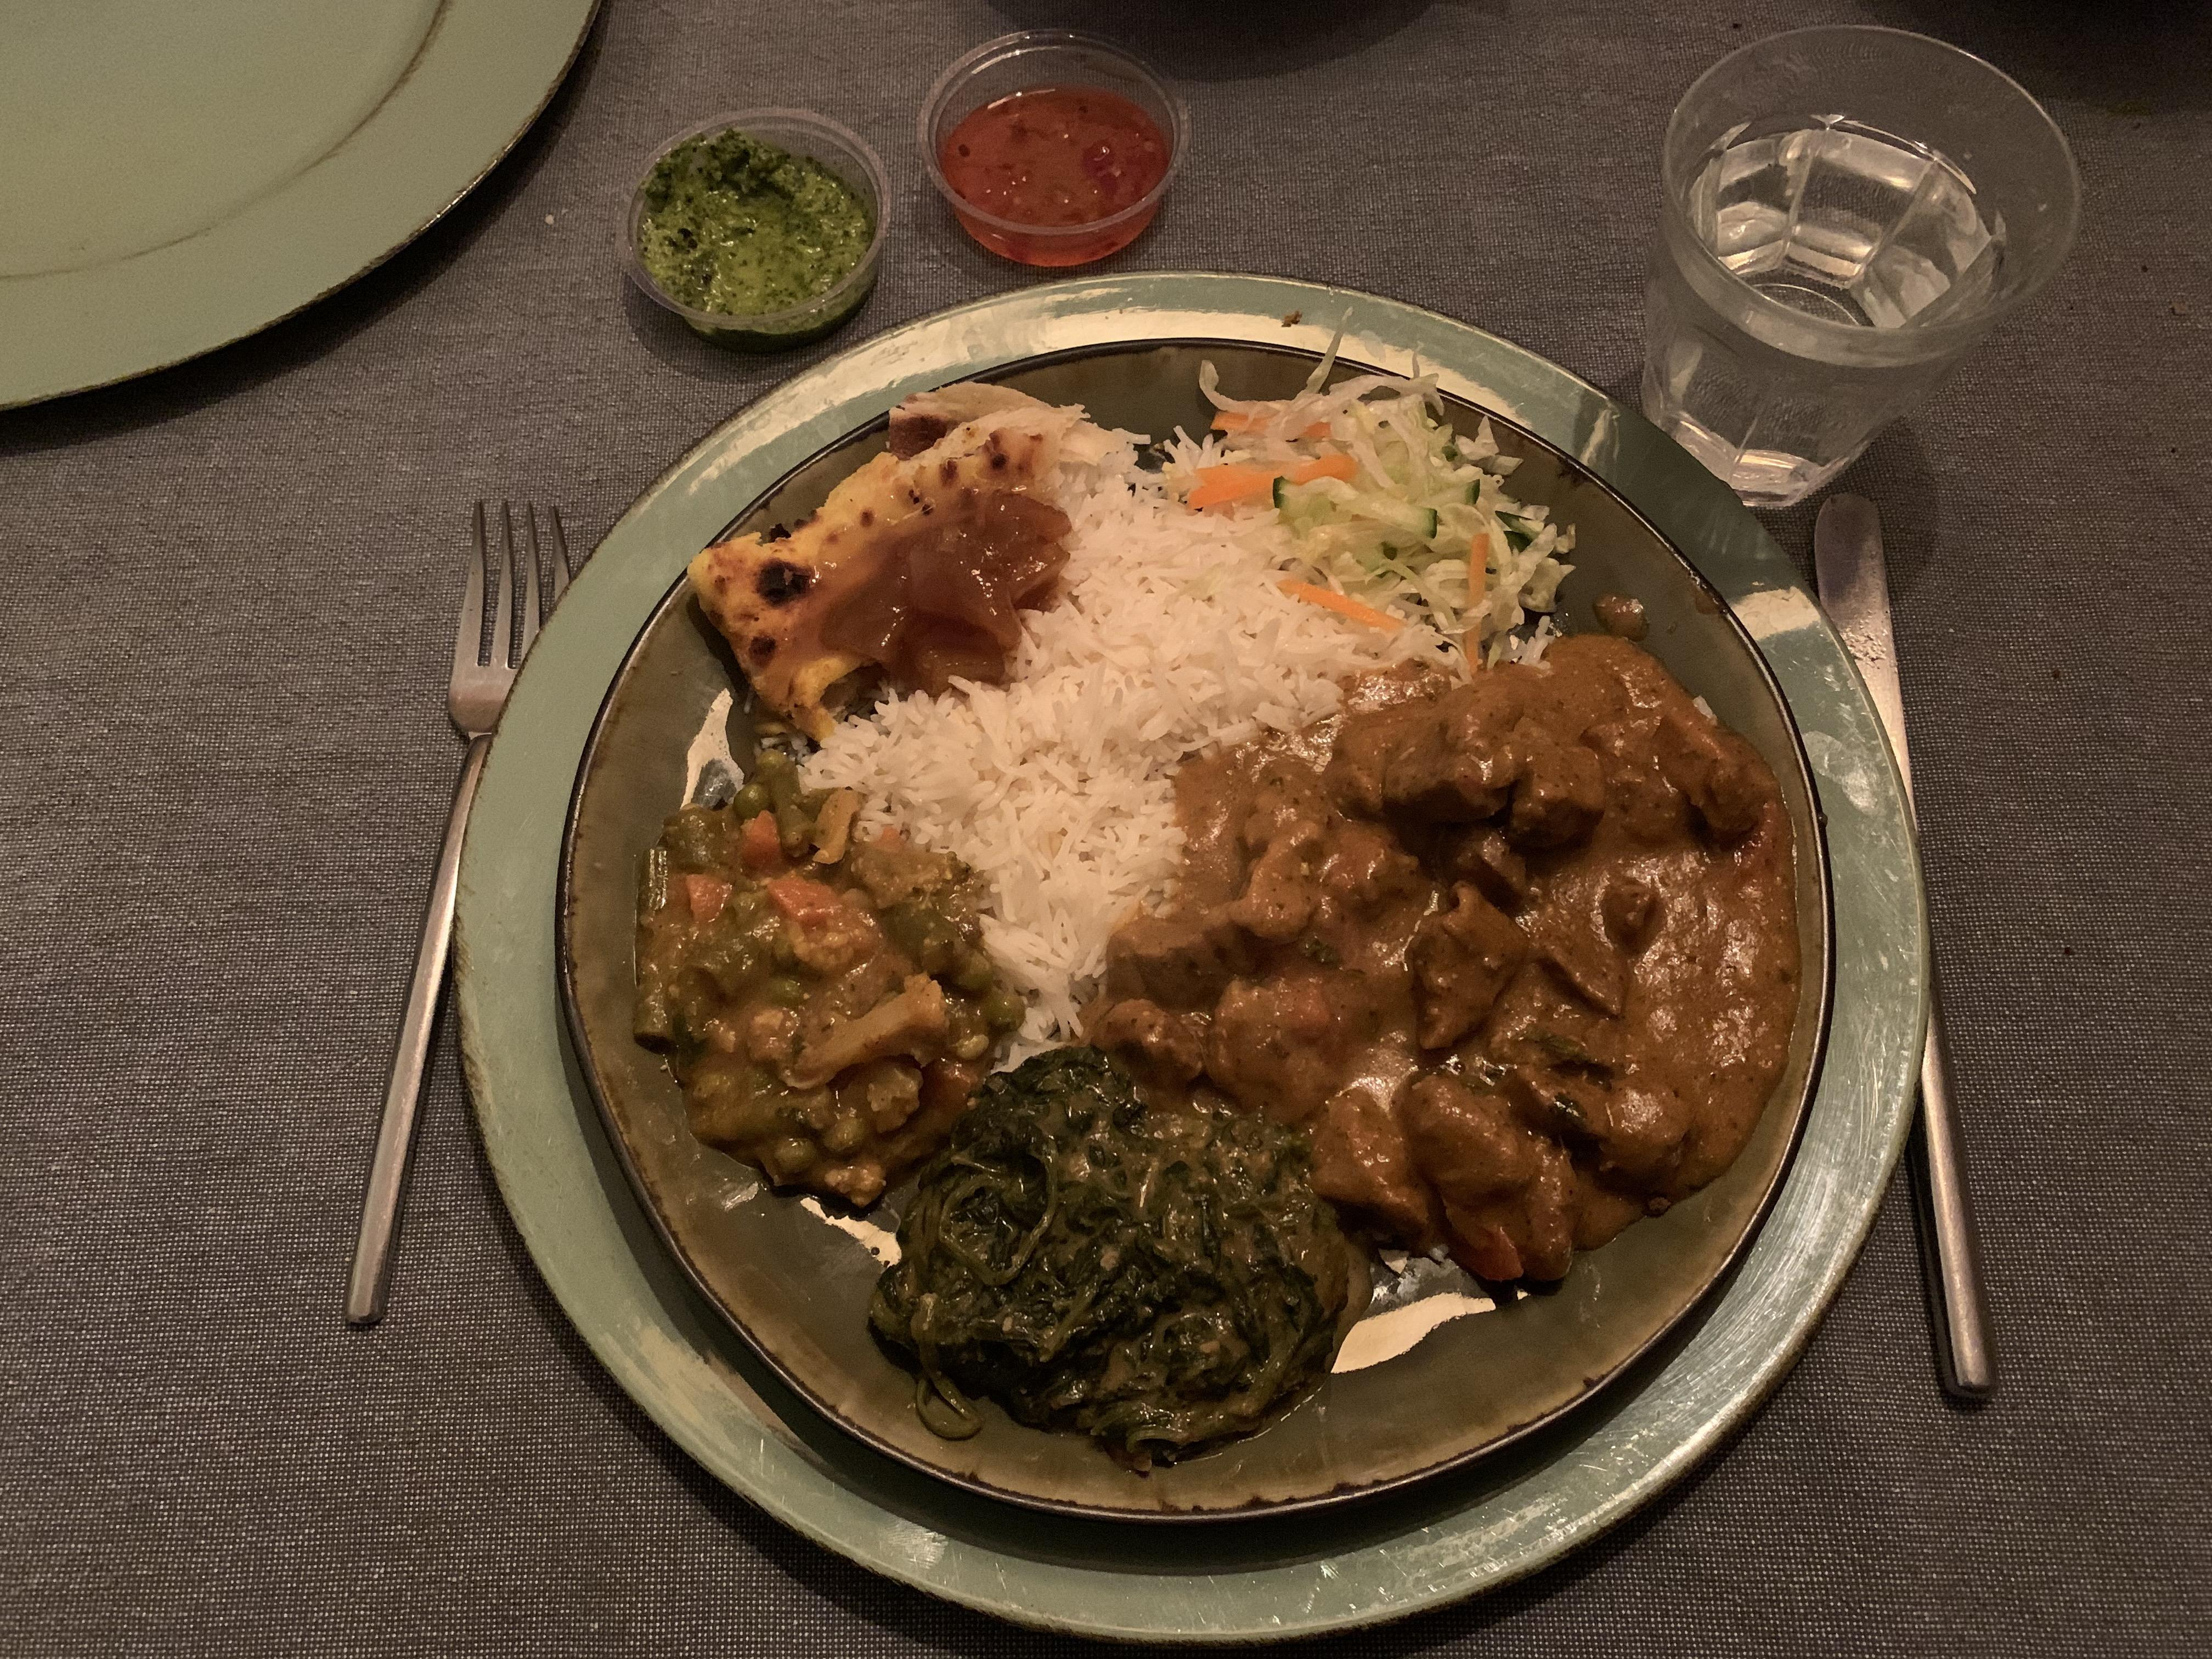 Pittig en veel Nepalees aan huis. Is wat knapperig moet zijn (onderweg) niet papperig geworden? Ghorka in Hilversum onder 't vergrootglas